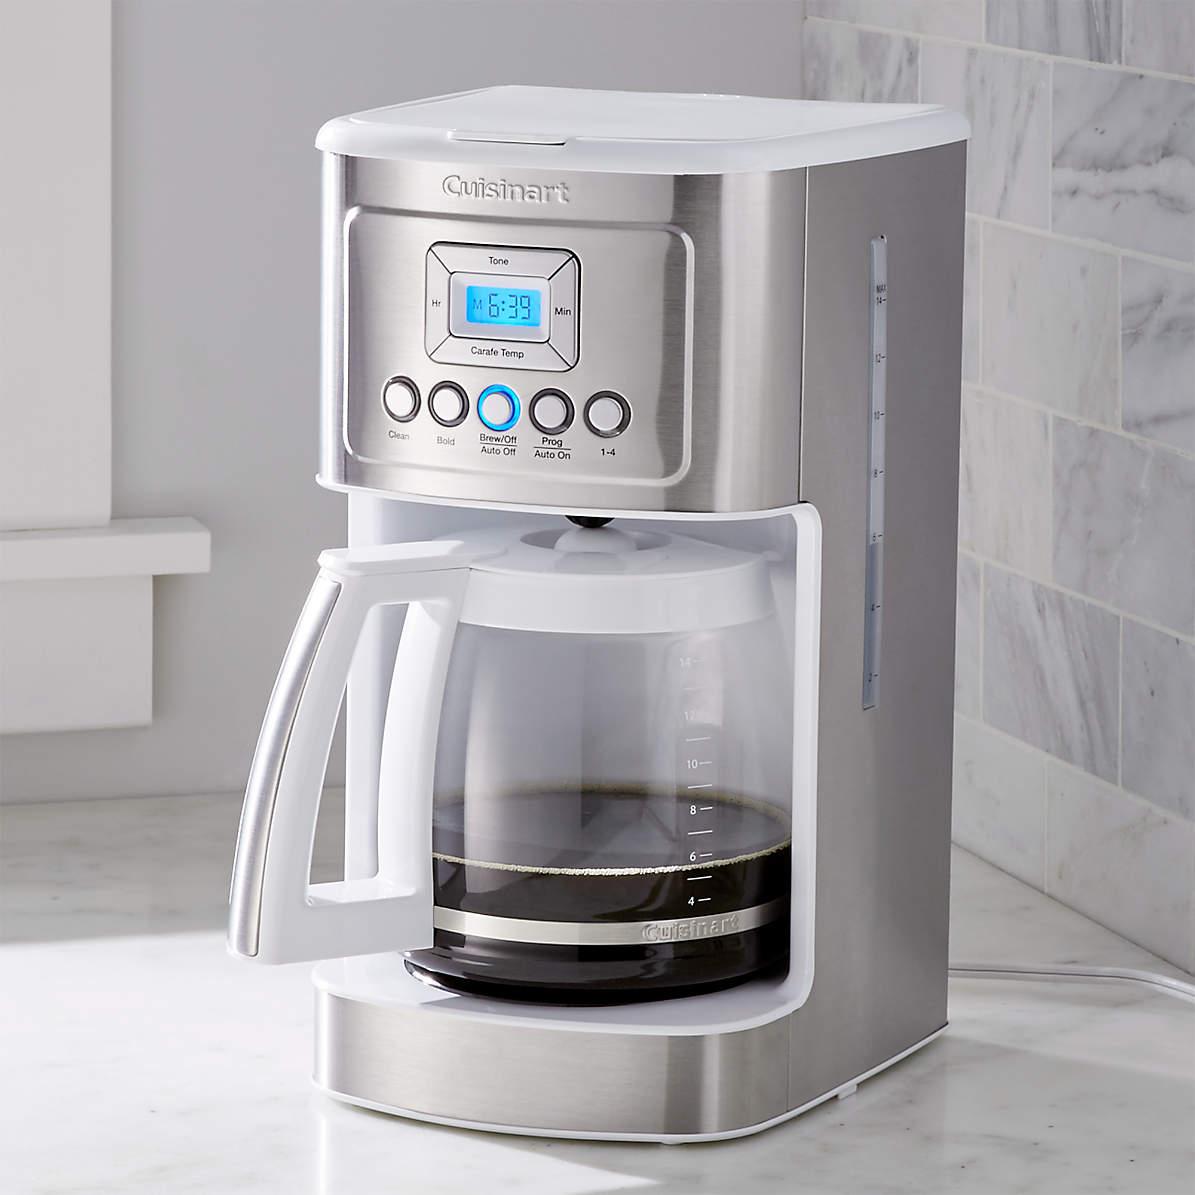 Cuisinart Perfectemp 14 Cup Programmable Coffeemaker Reviews Crate And Barrel